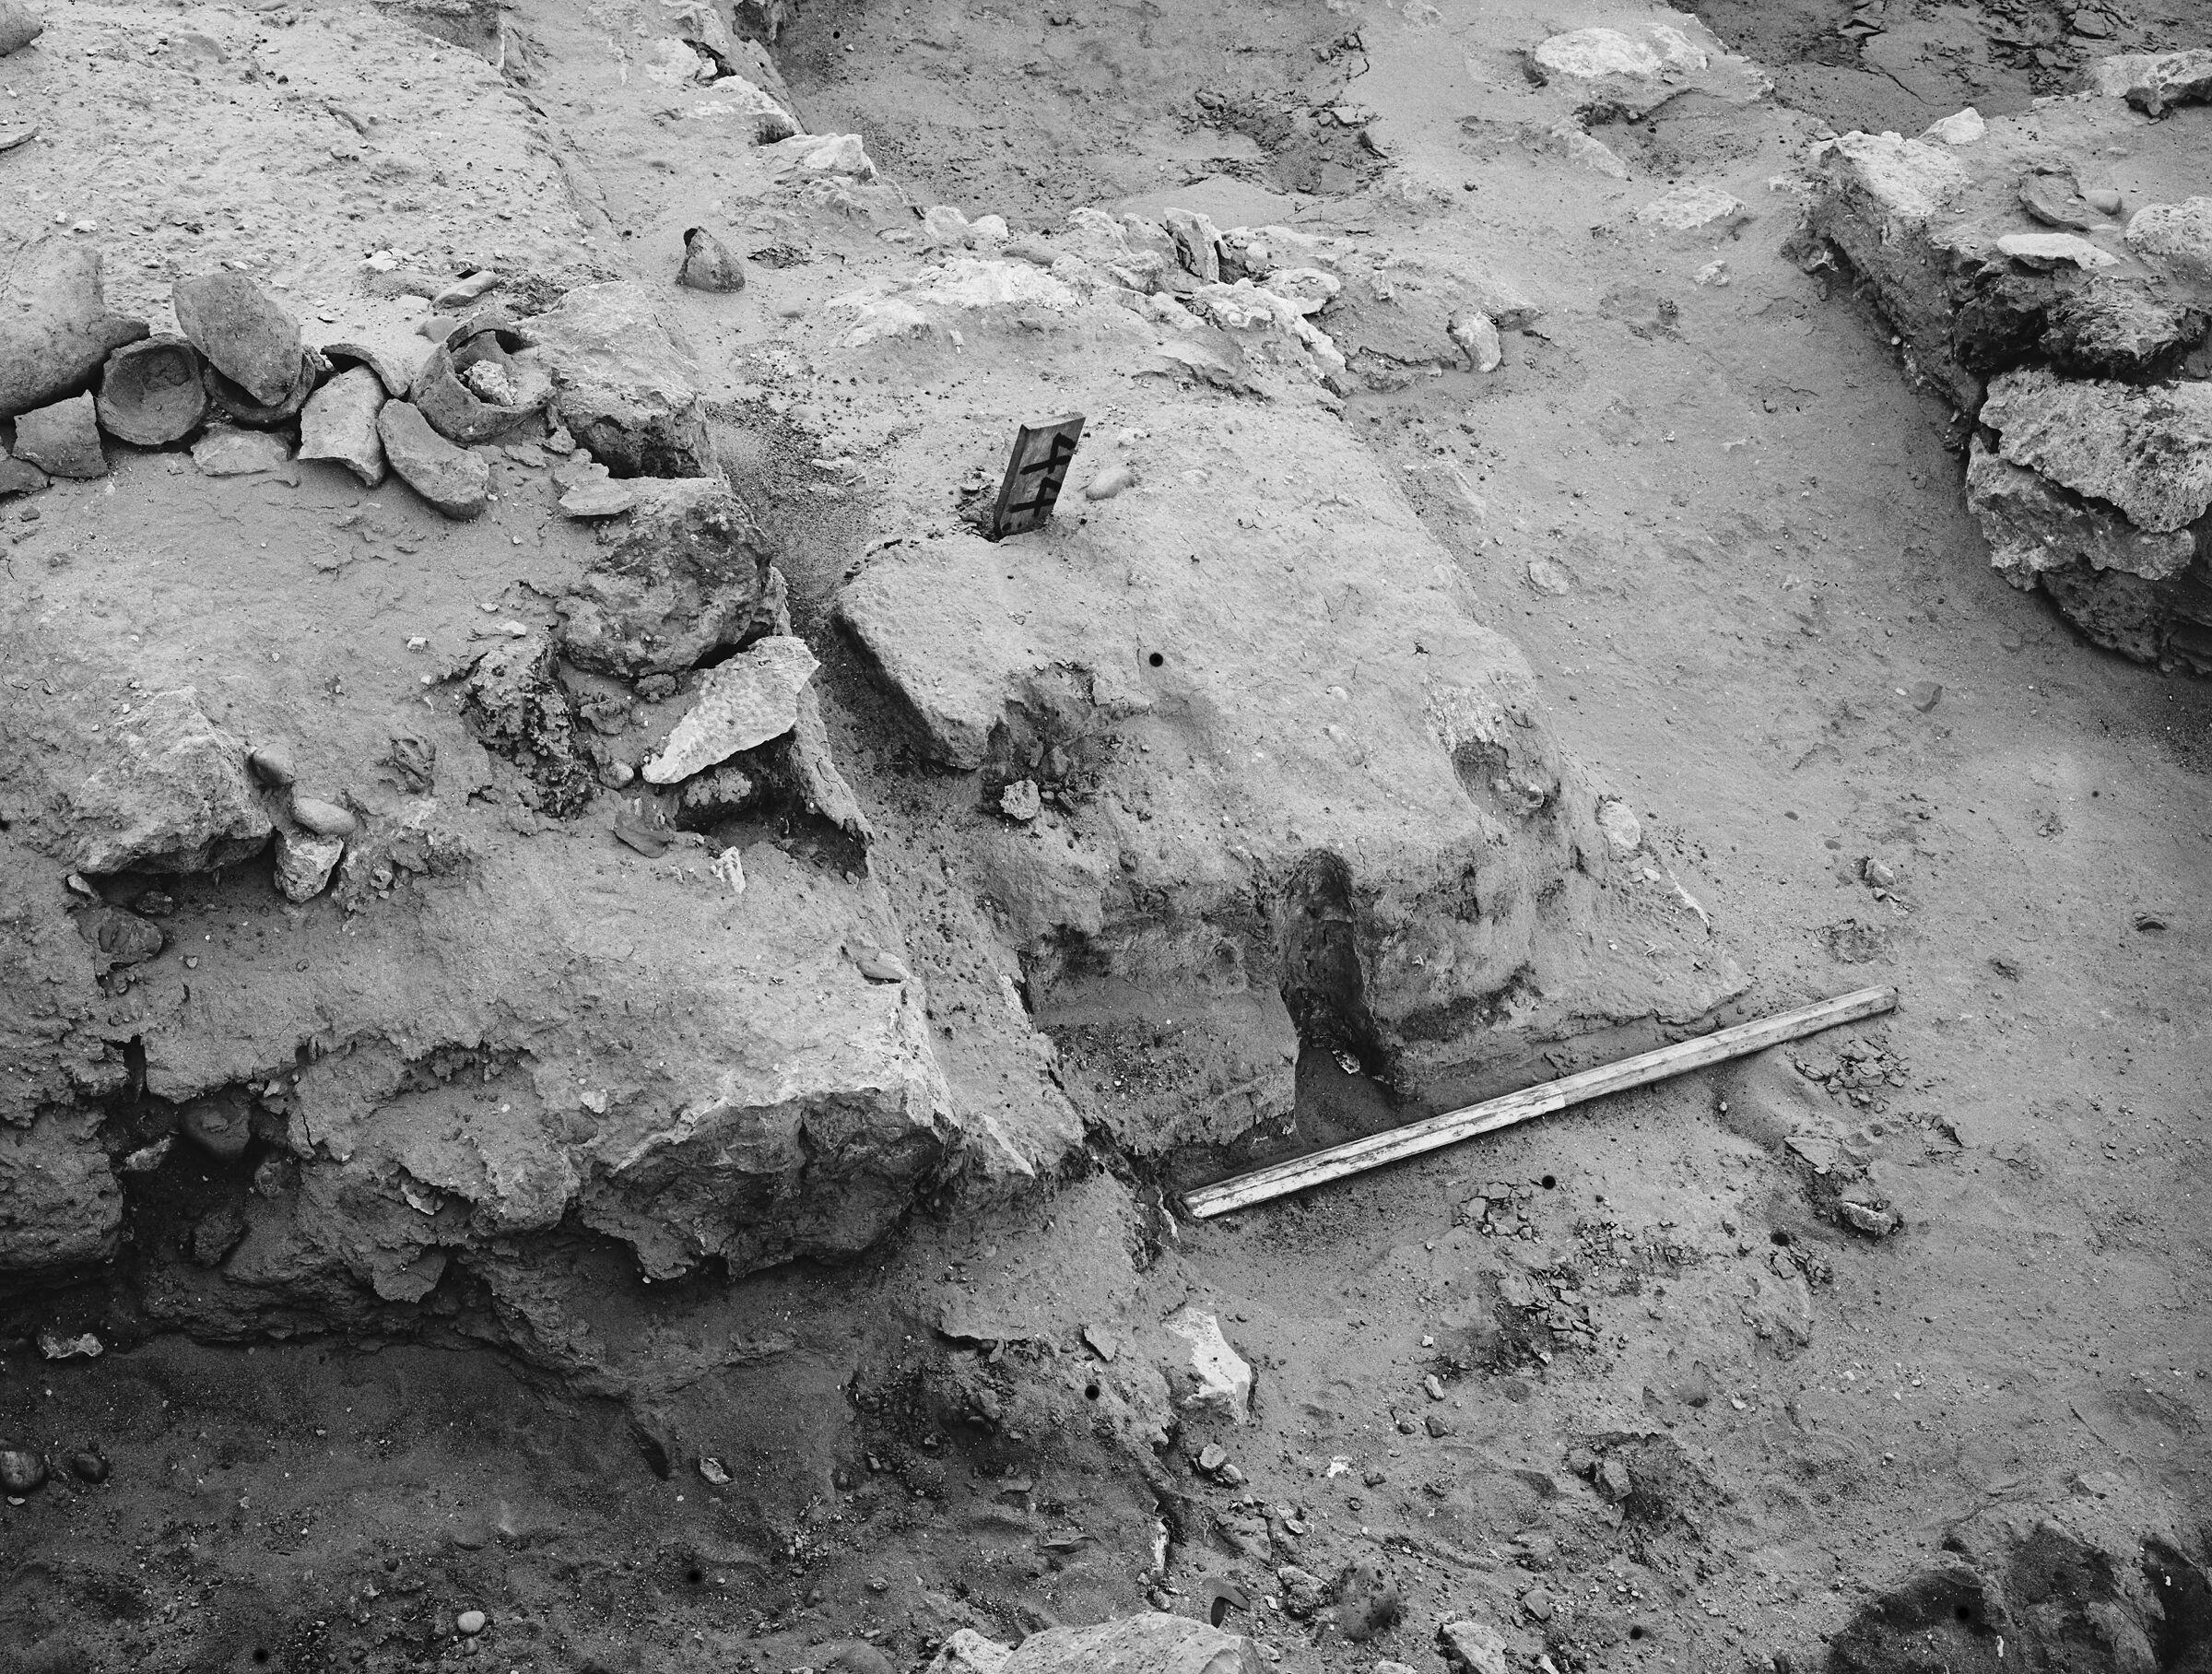 Wadi Cemetery (Reisner; north of W. Cem): Site: Giza; View: GW 43, GW 44, GW 56